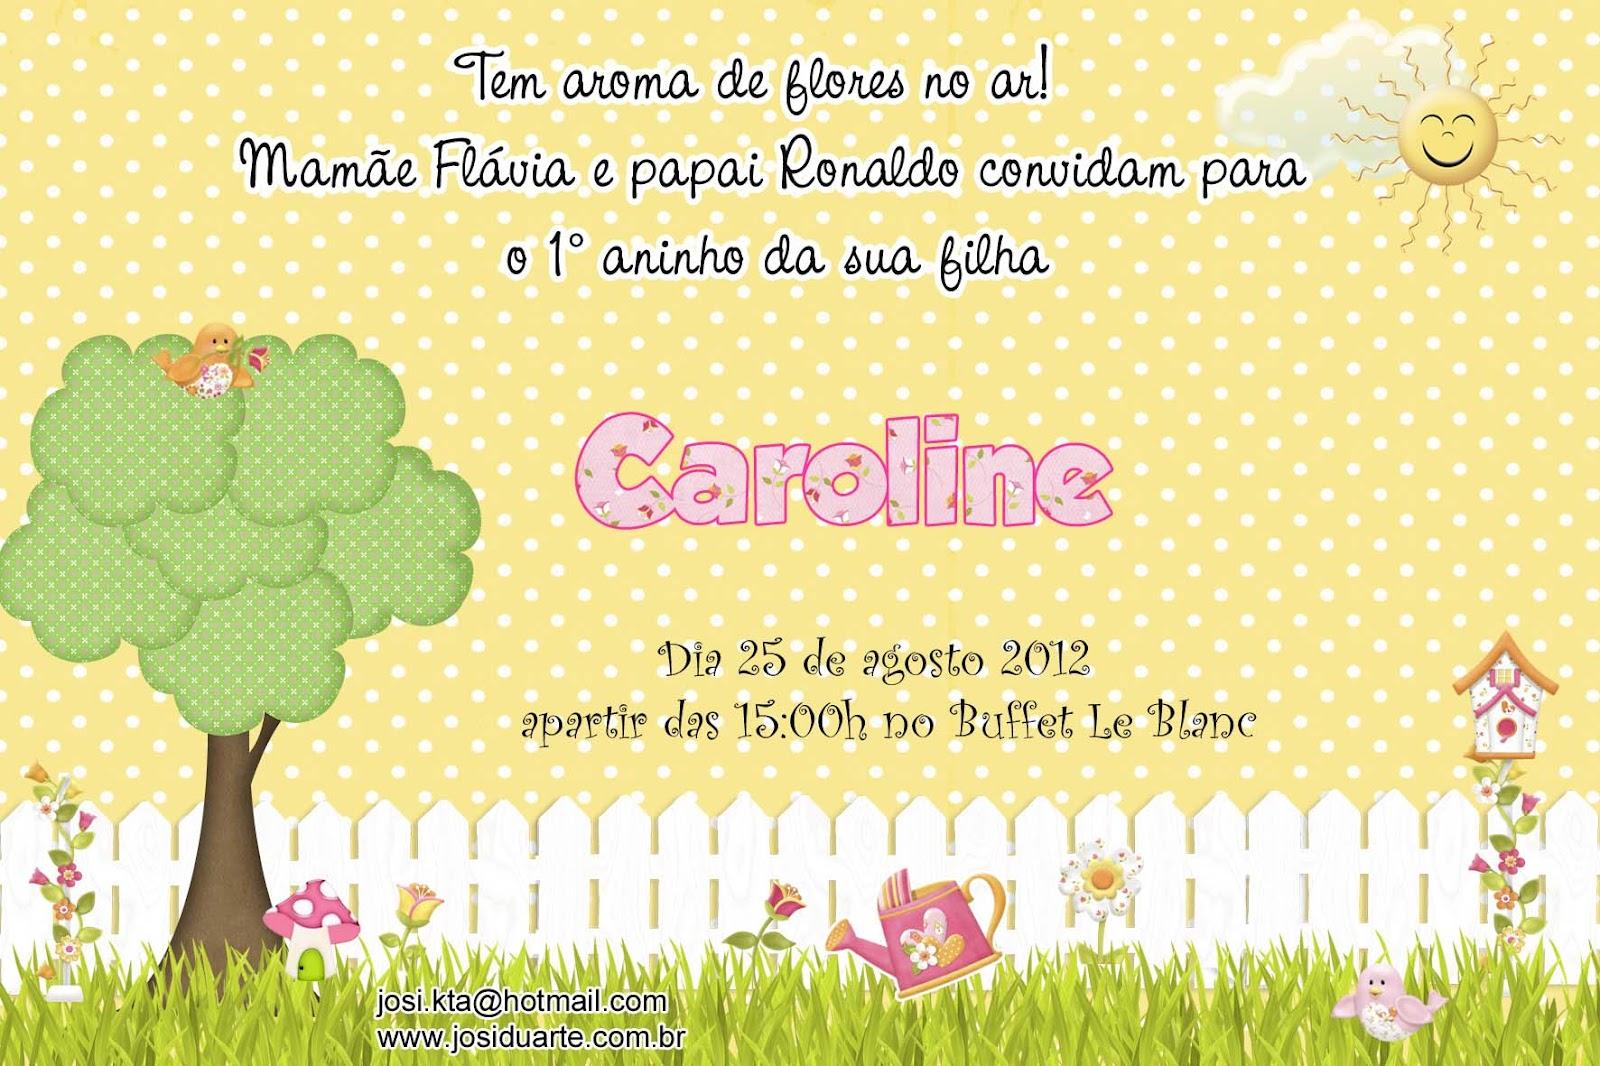 moldura para fotos tema jardim encantado : moldura para fotos tema jardim encantado:Ateliê Josi Duarte: Convite jardim encantado amarelo